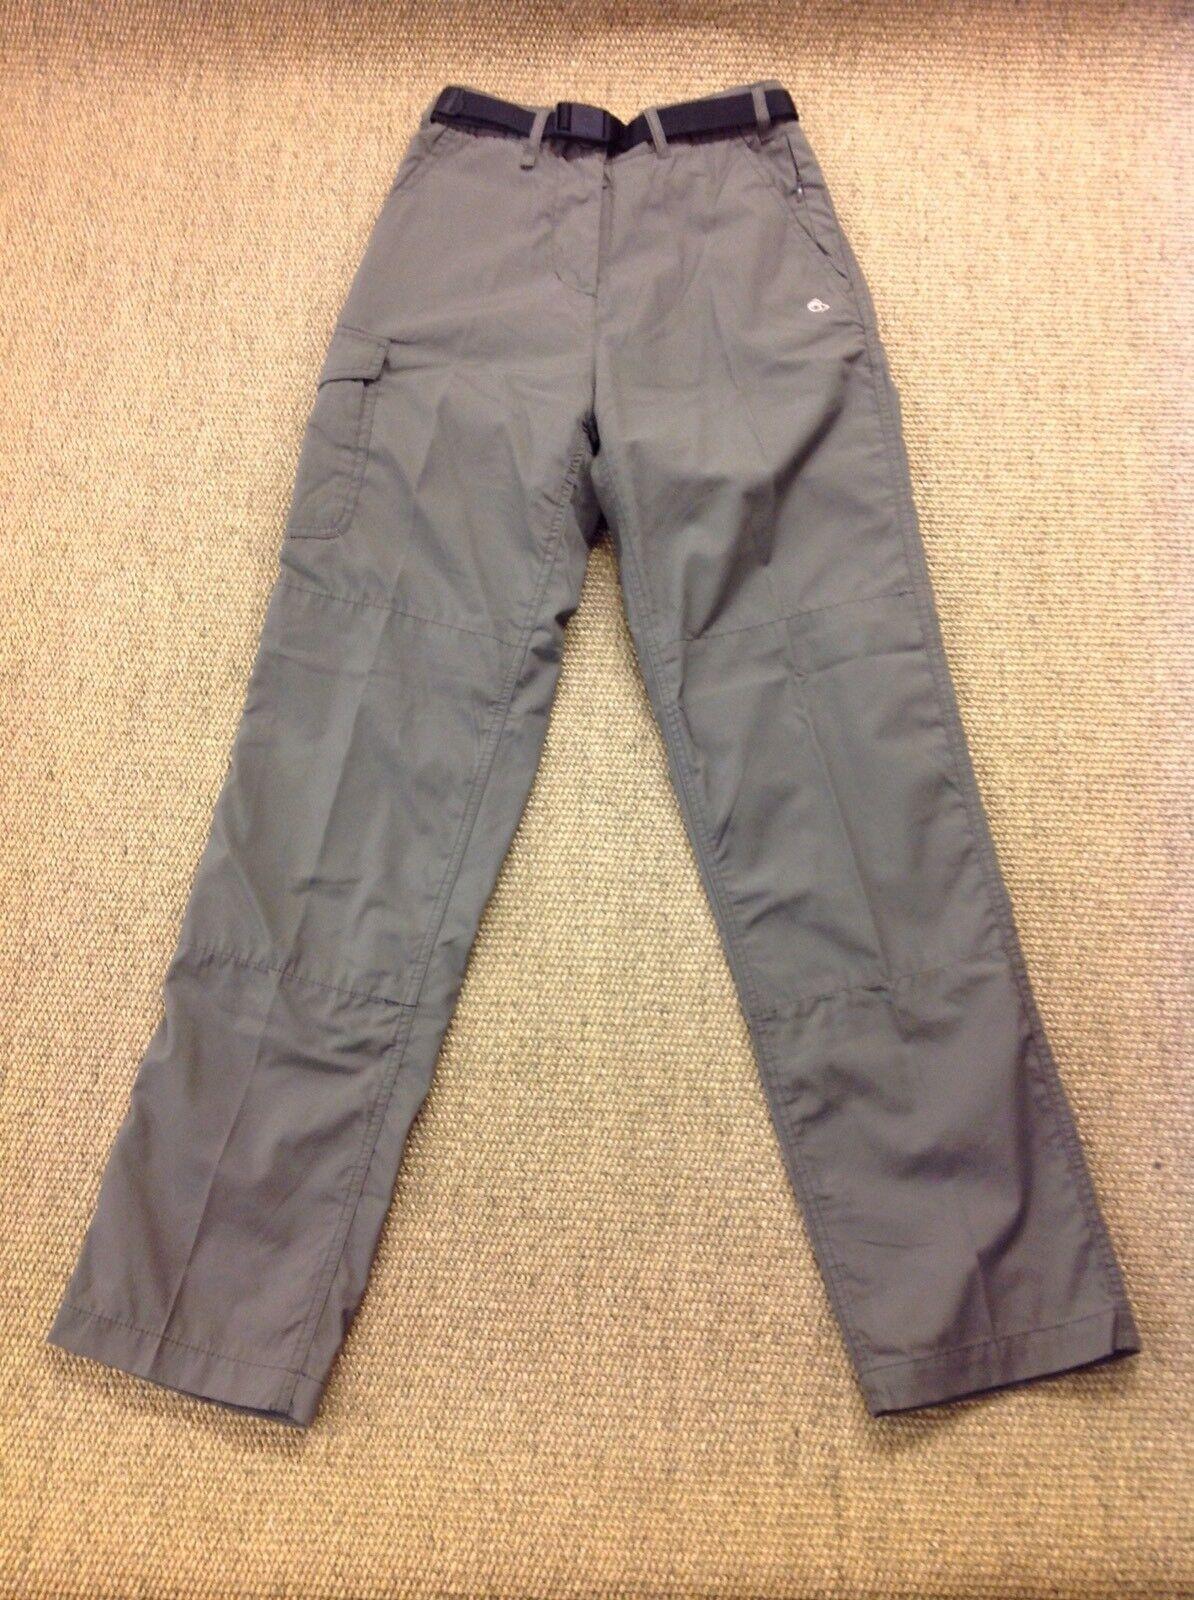 Woman's CRAGHOPPERS Size 8, L31 Kiwi Solardry Green Walking Trousers. Superb